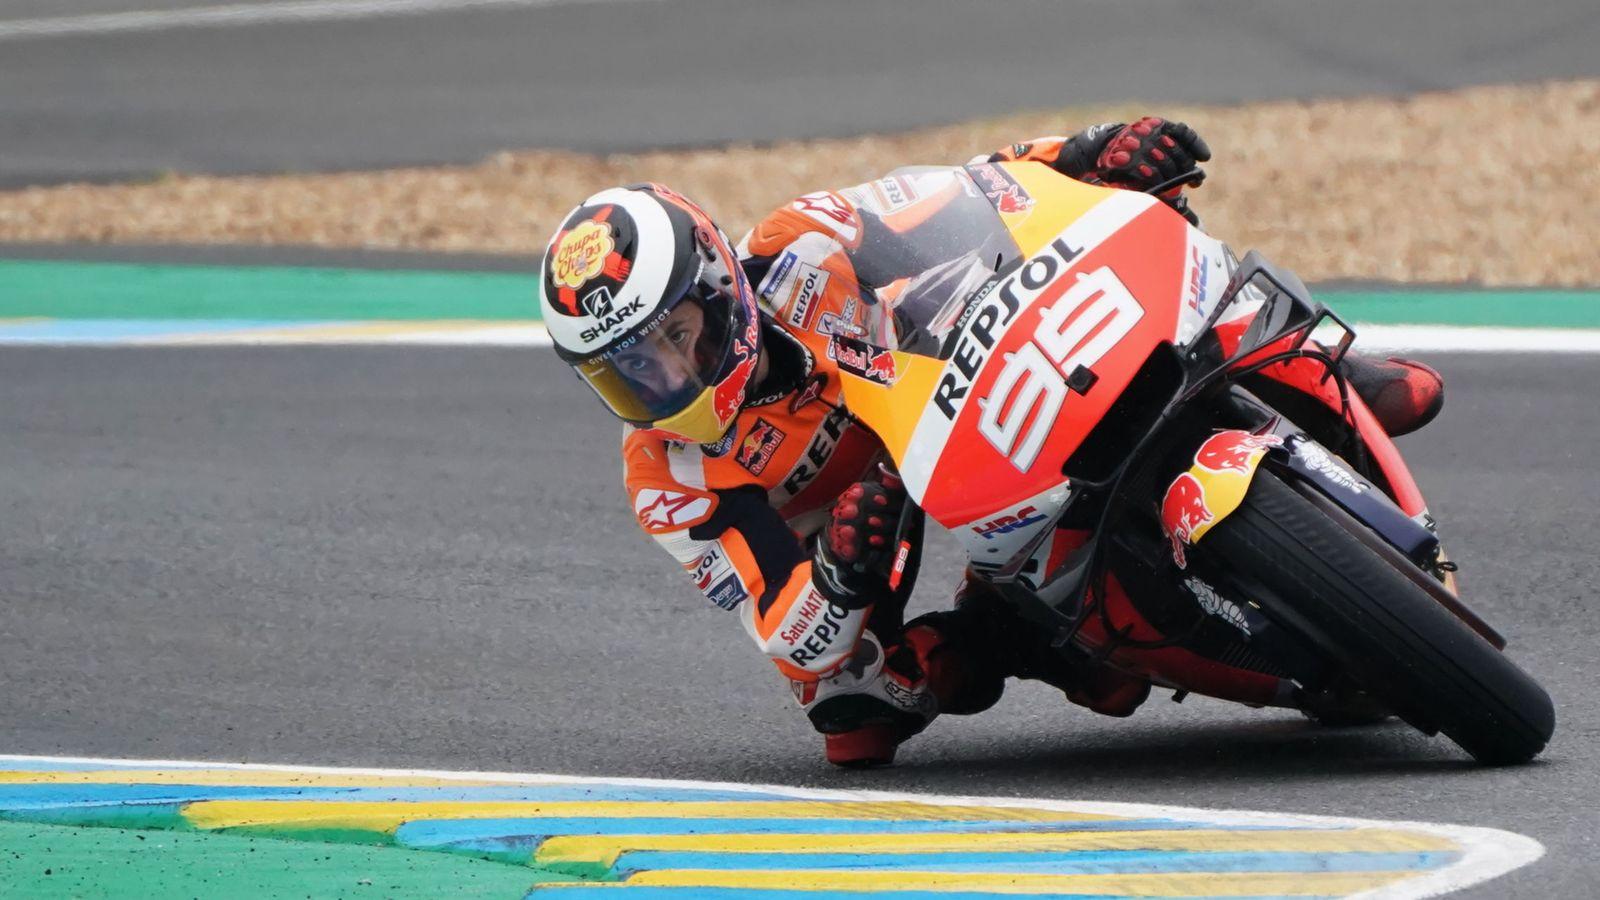 Foto: Jorge Lorenzo, este domingo en Le Mans. (EFE)